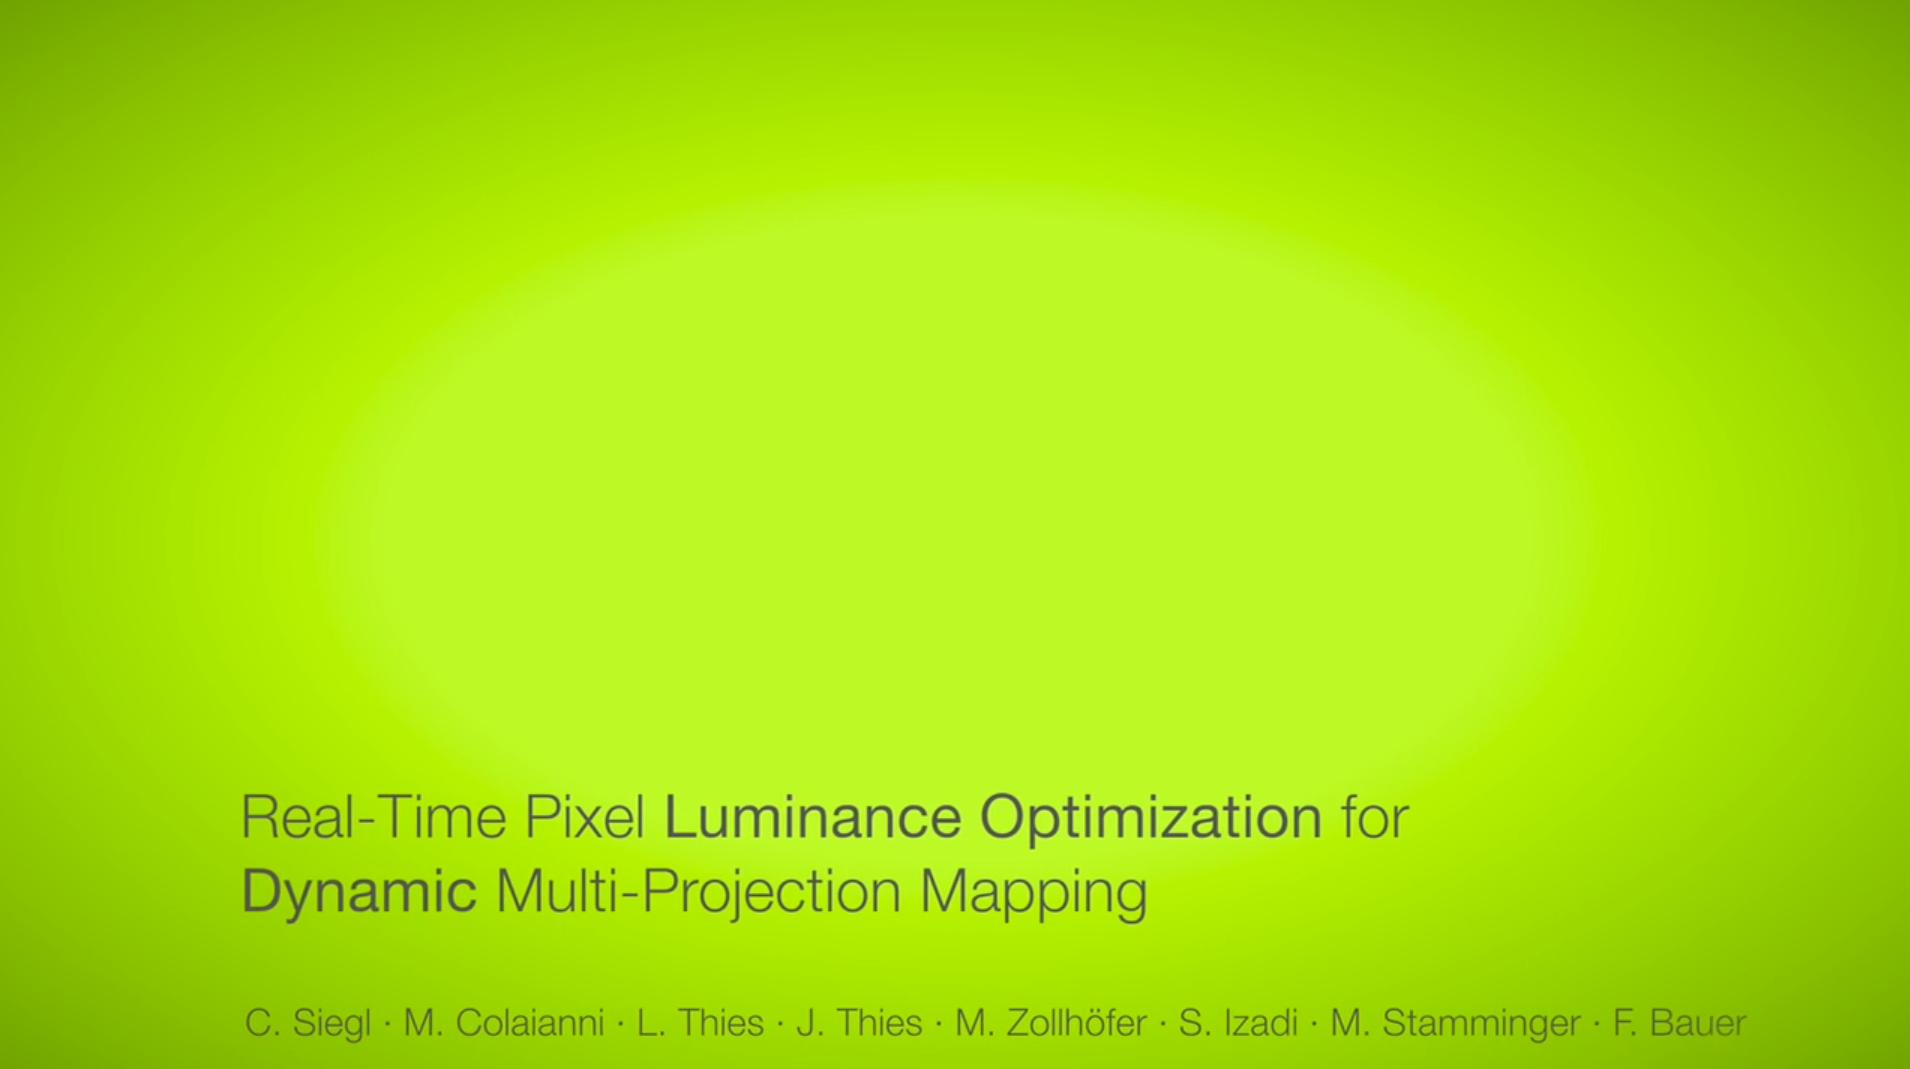 Real-Time Pixel Luminance Optimization for Dynamic Multi